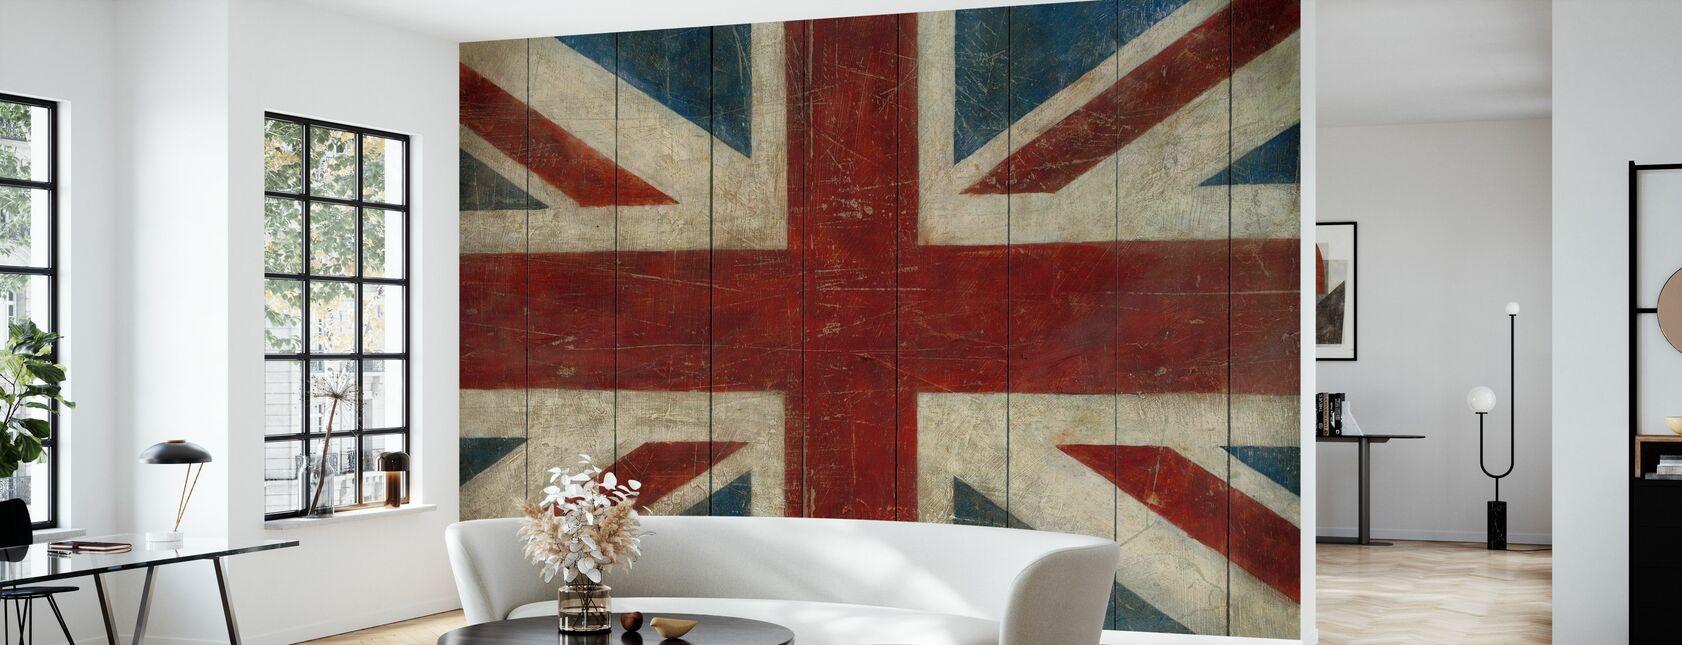 Avery Tillmon - Union Jack - Tapet - Stue